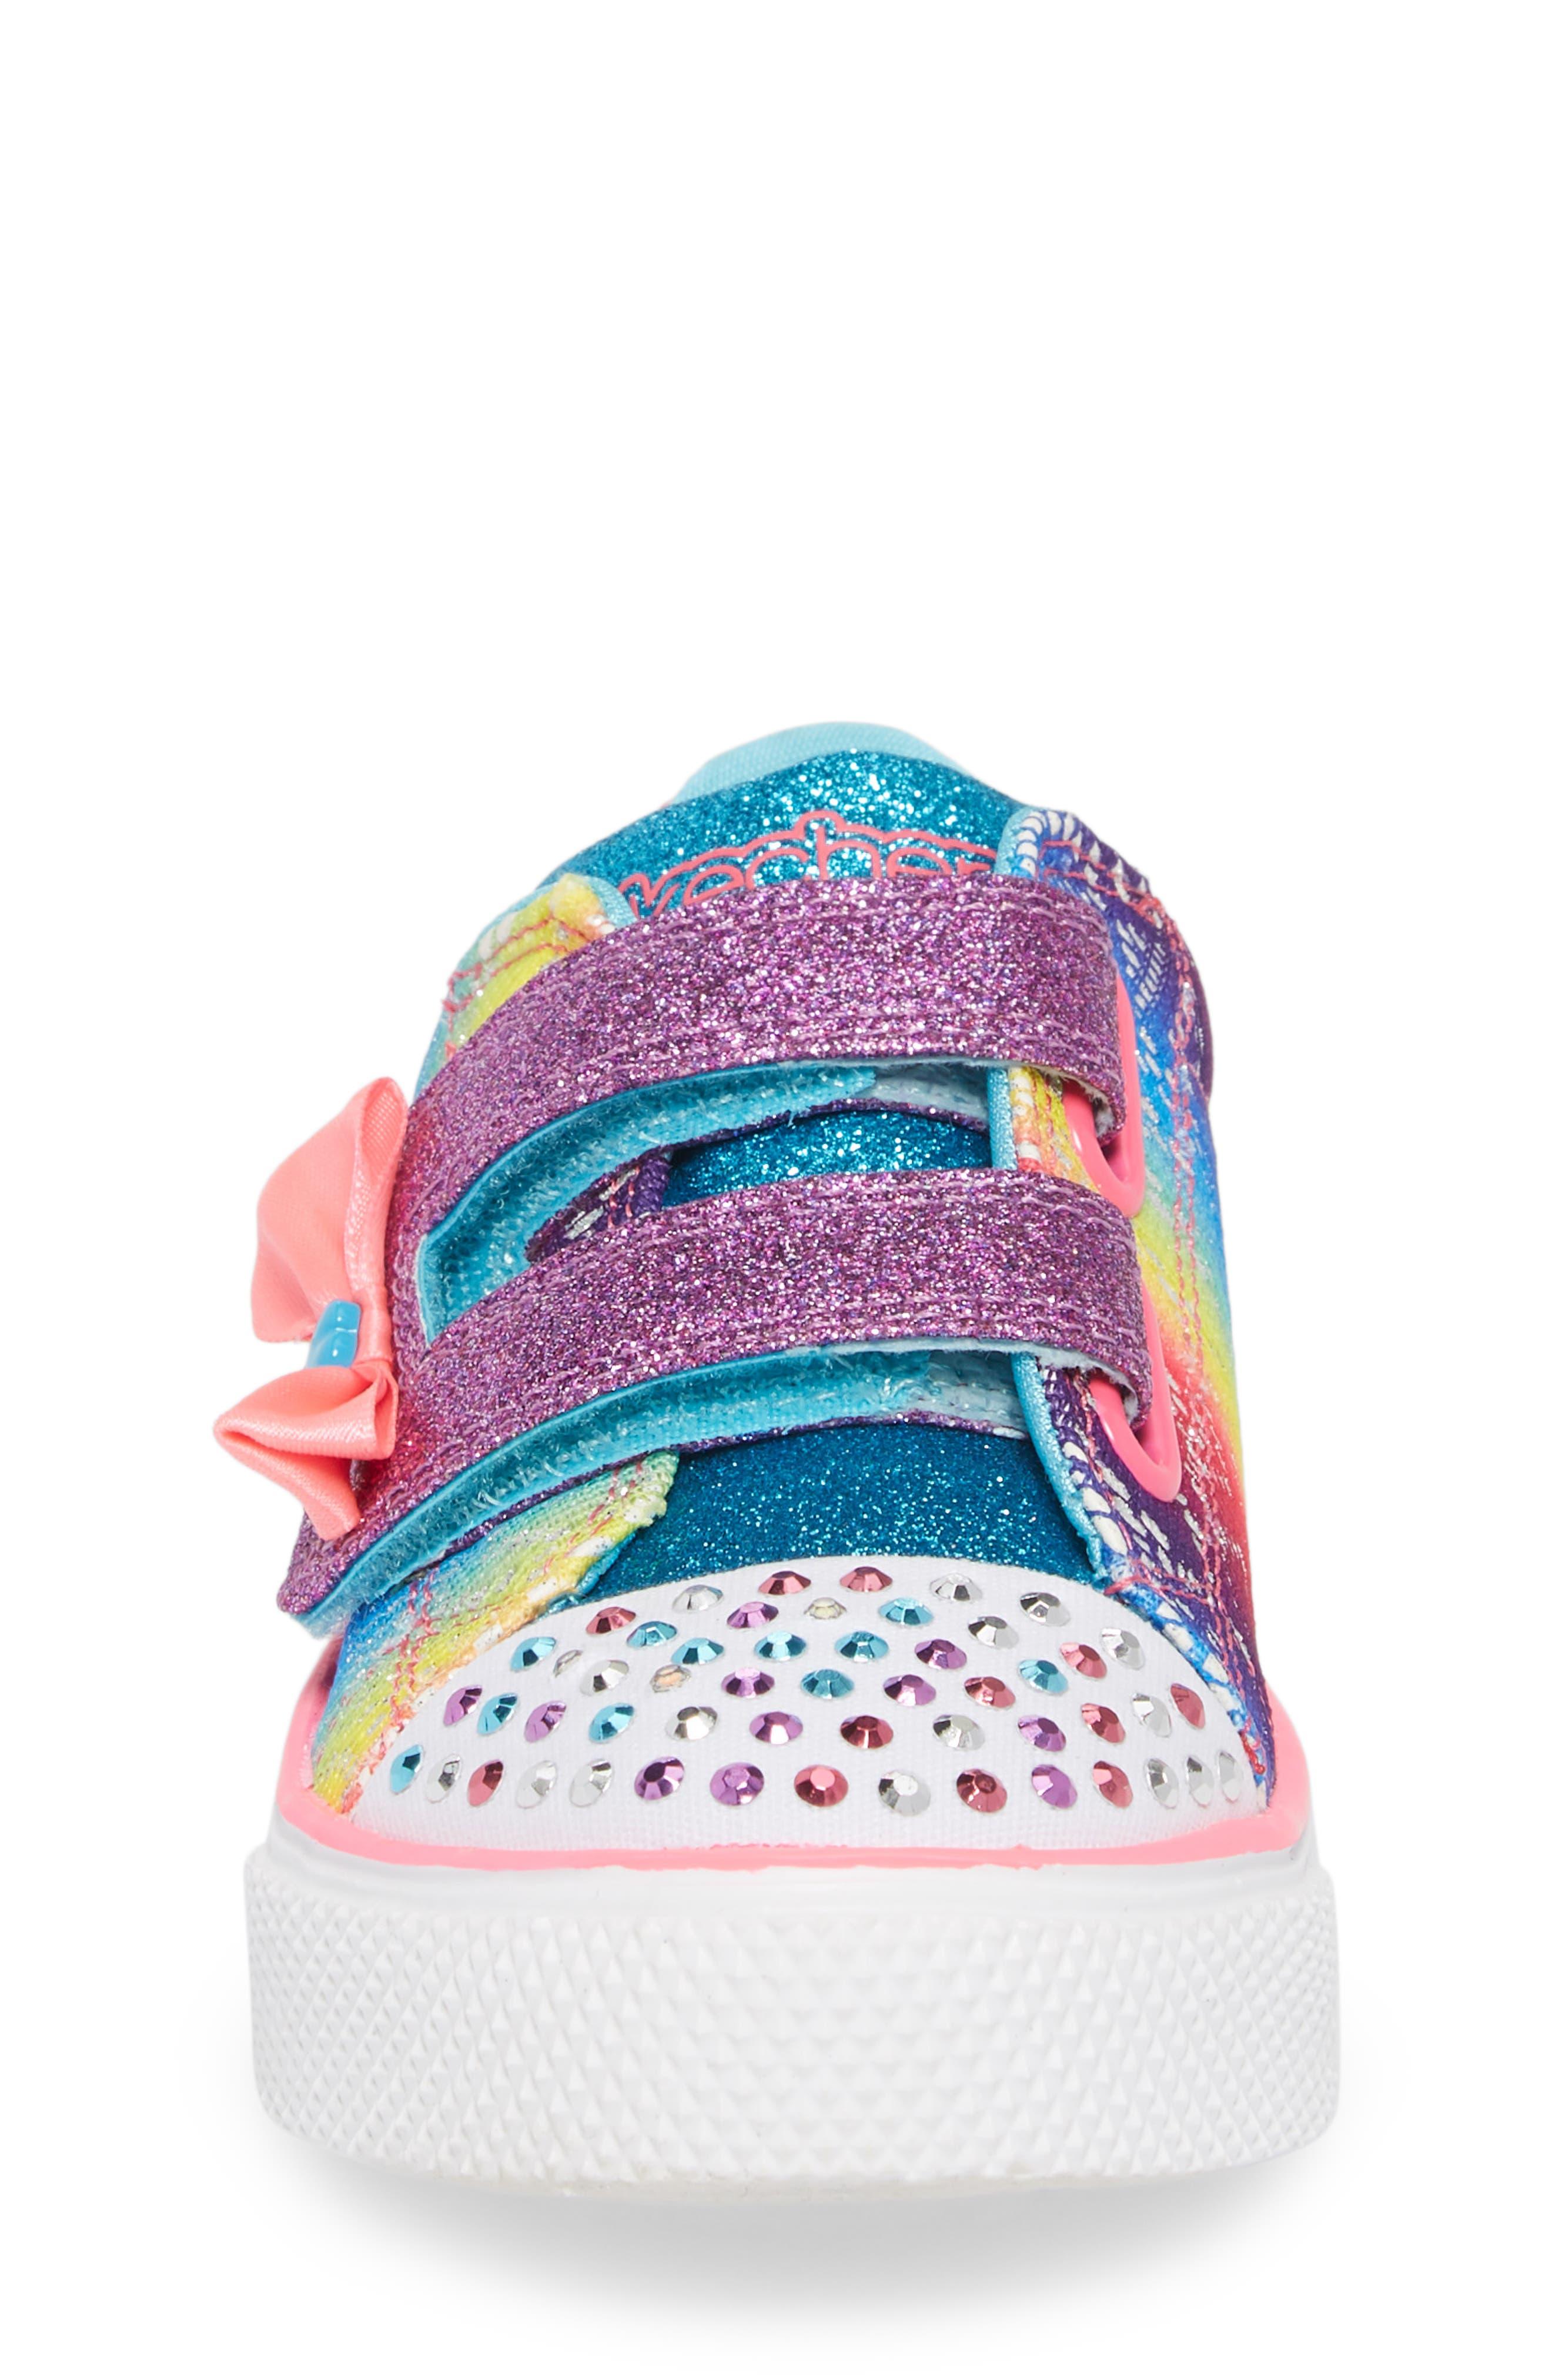 Twinkle Toes Breeze 2.0 Light-Up Sneaker,                             Alternate thumbnail 4, color,                             Multi